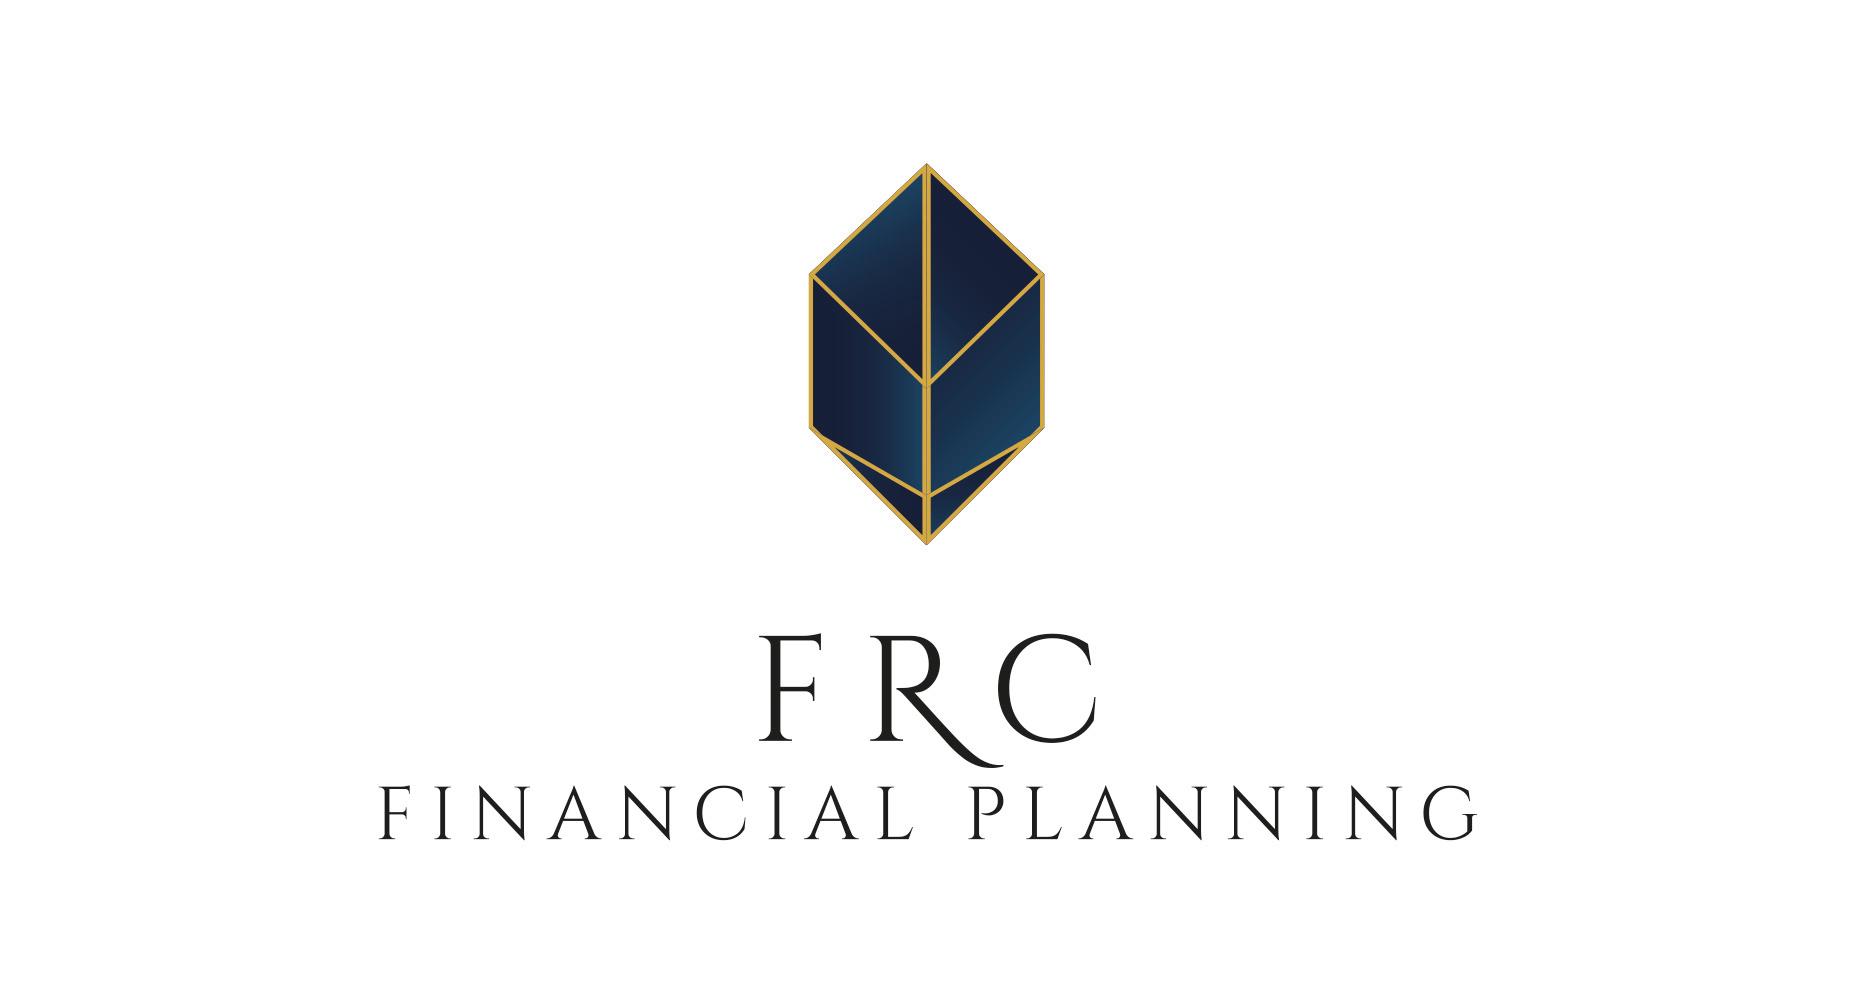 FRC Financial Planning